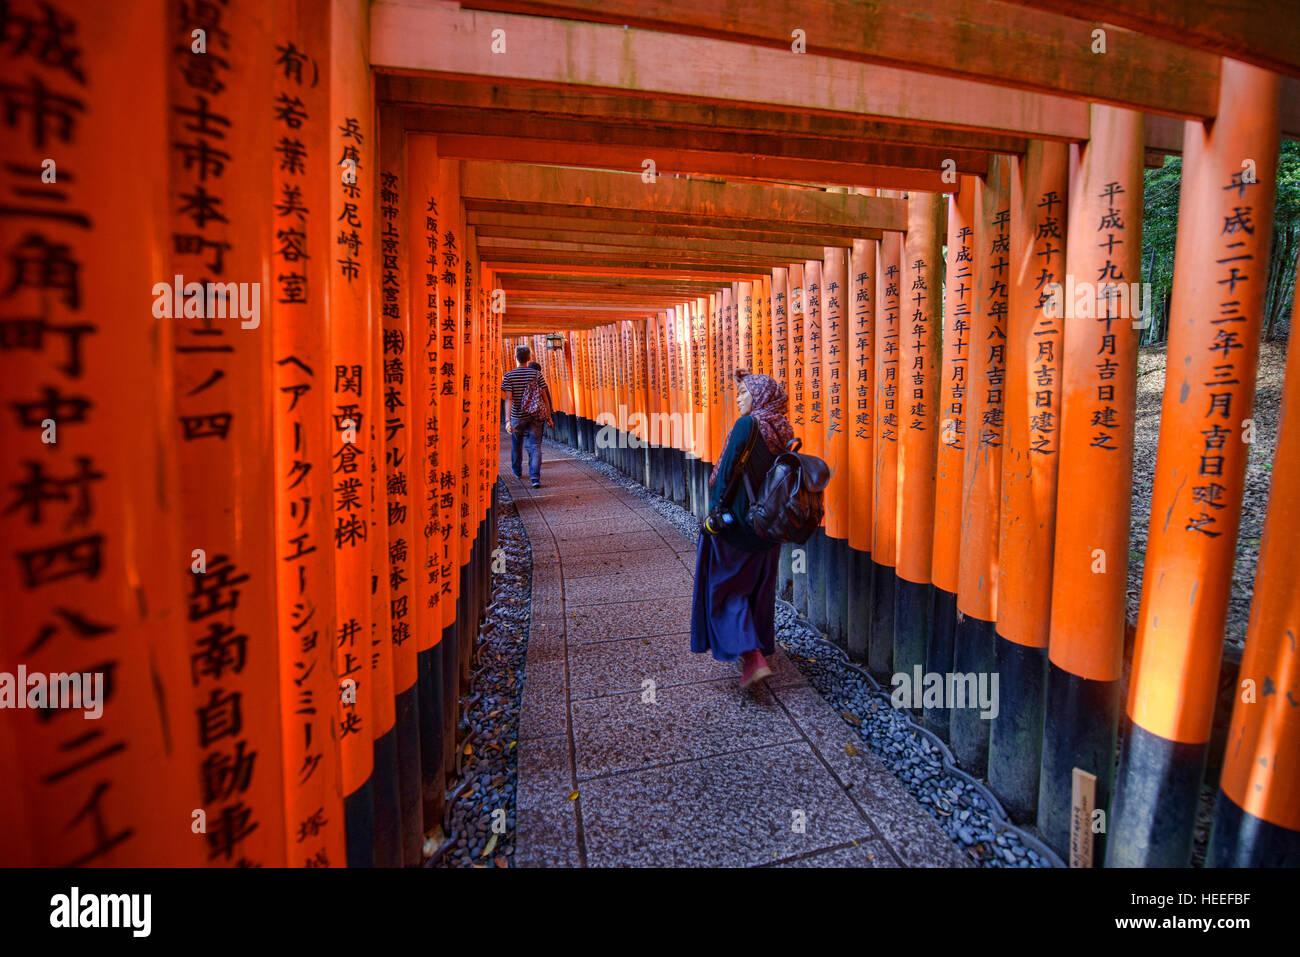 Endless torii shrine gates at Fushimi Inari Shrine, Kyoto, Japan - Stock Image